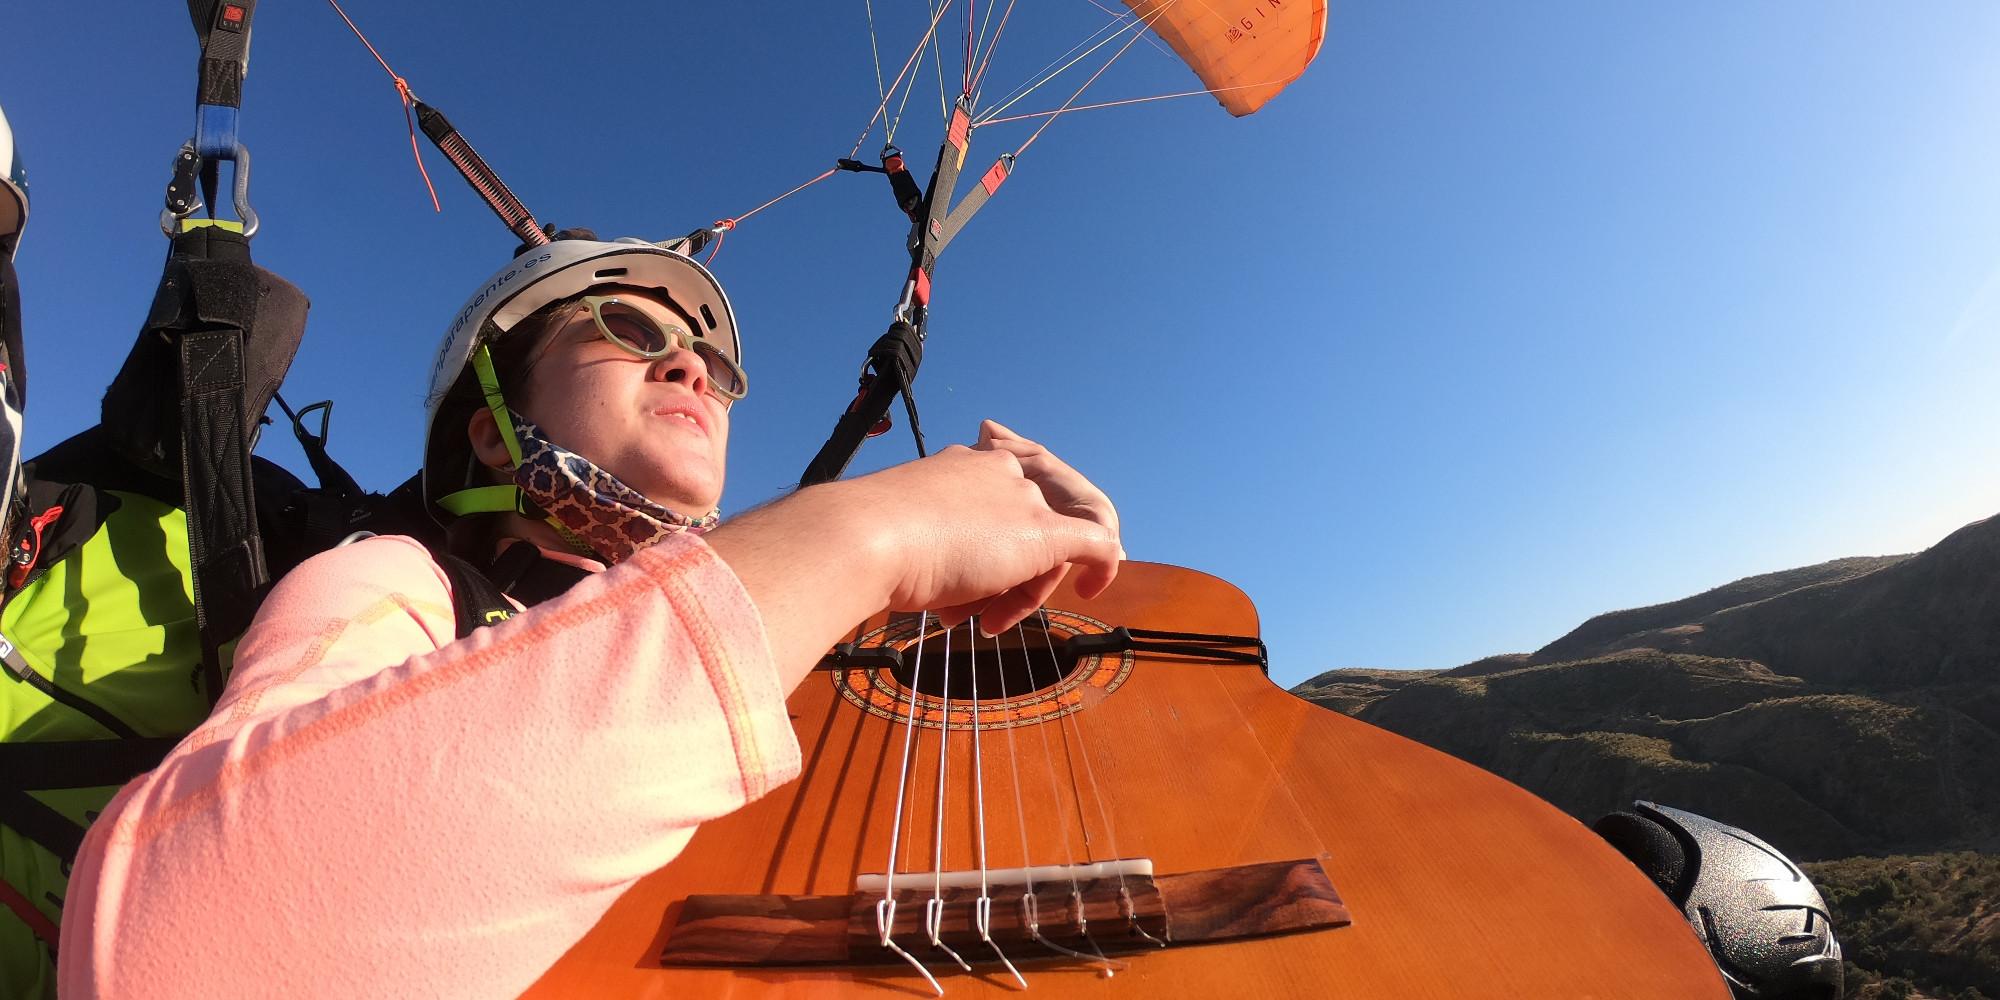 Blog - Expresion de libertad - Musica y vuelo libre